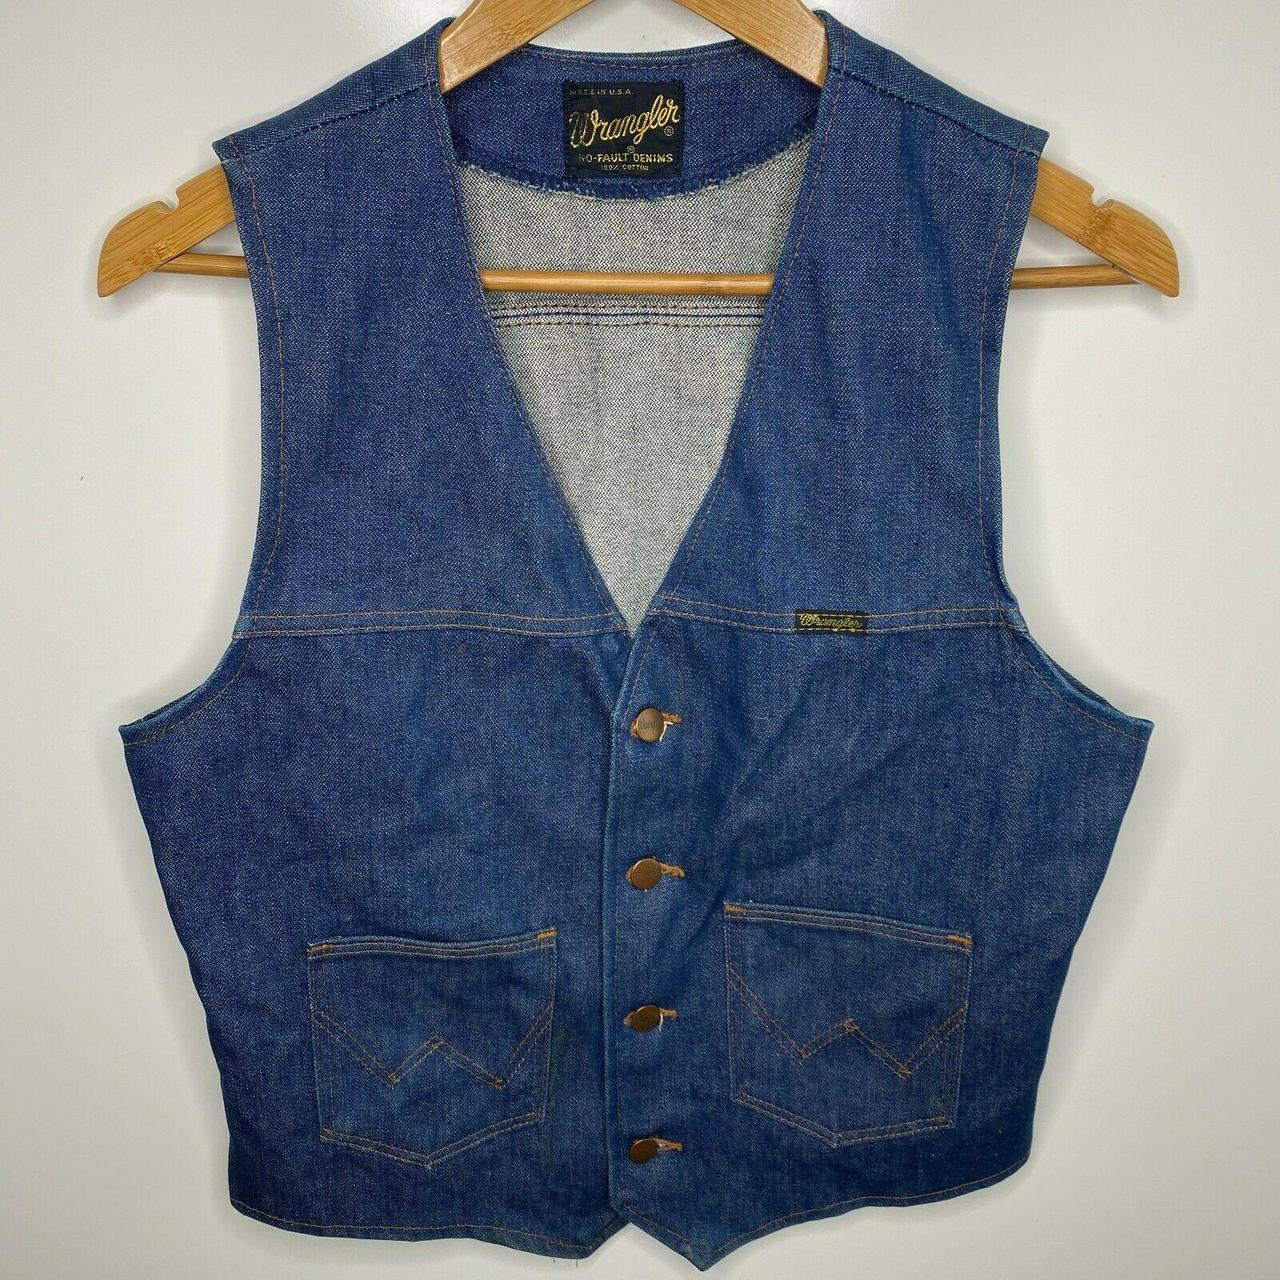 Product Image 1 - Wrangler Denim Vest Men's S